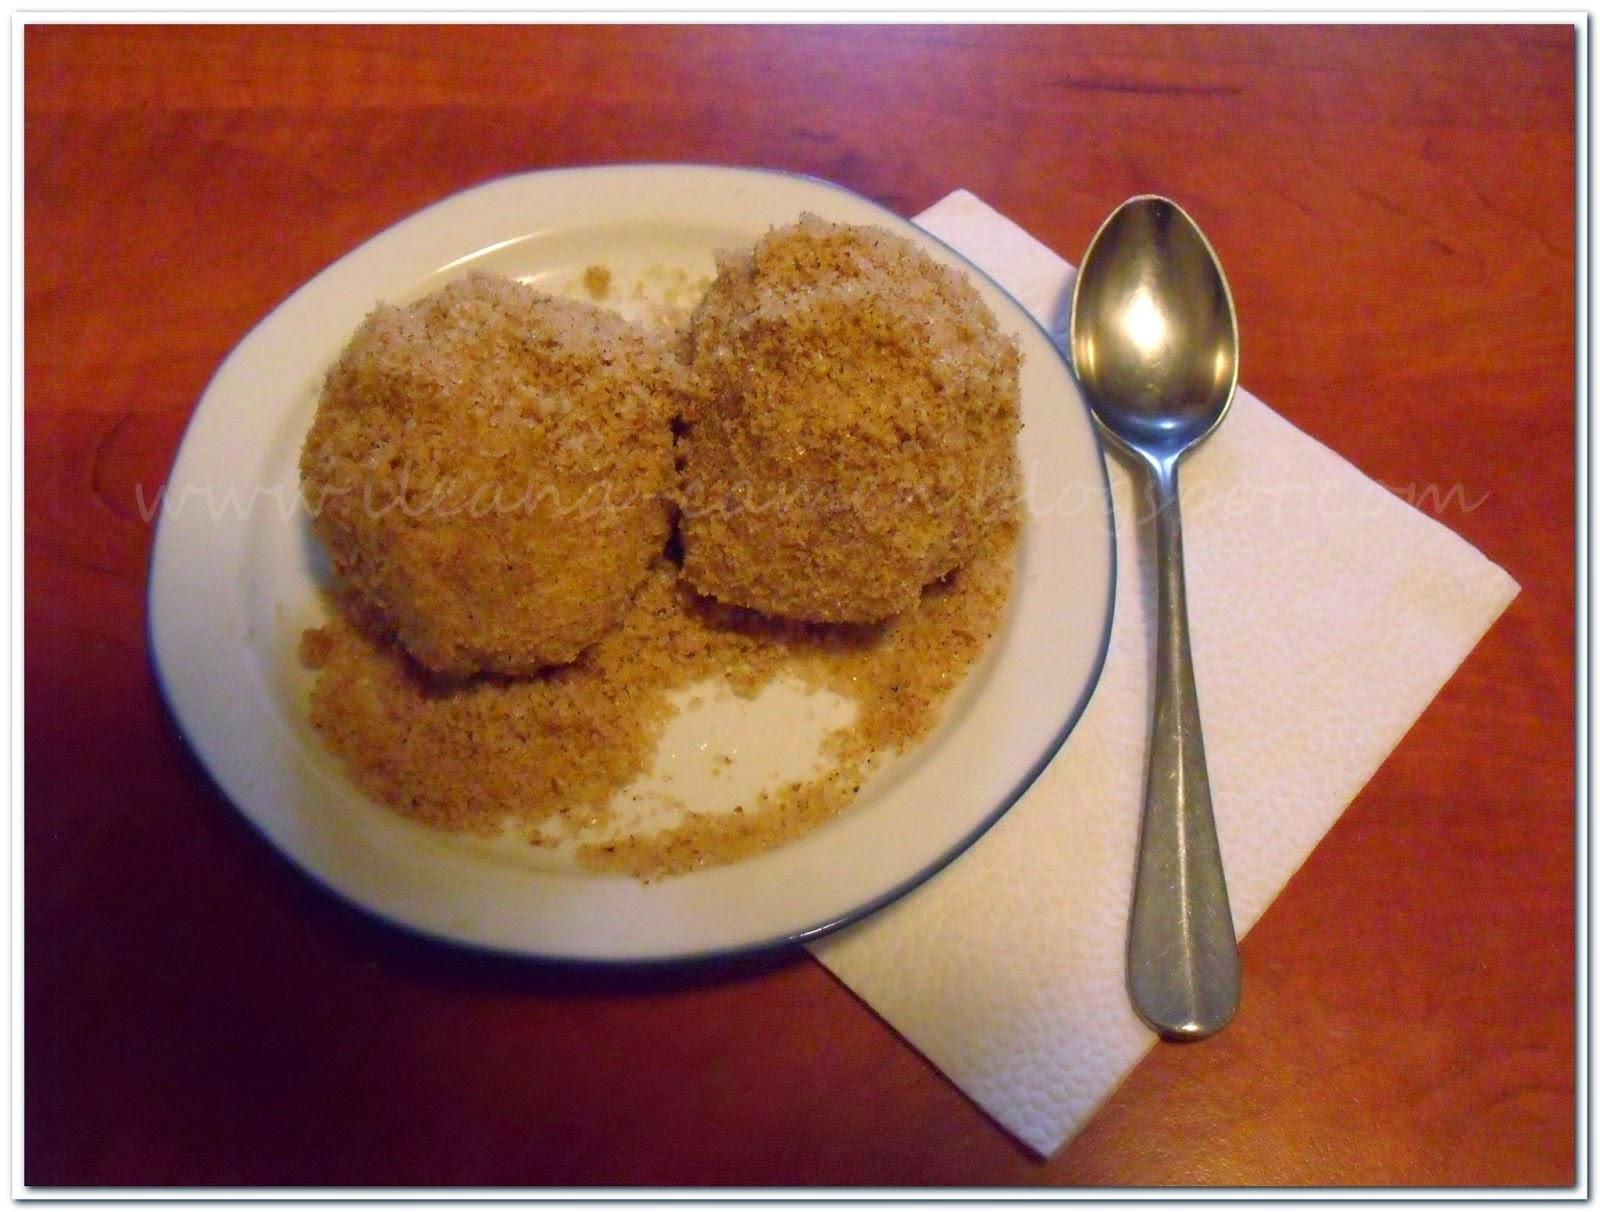 http://ileana-carmen.blogspot.ro/2014/12/receipe-dumplings-with-plum.html